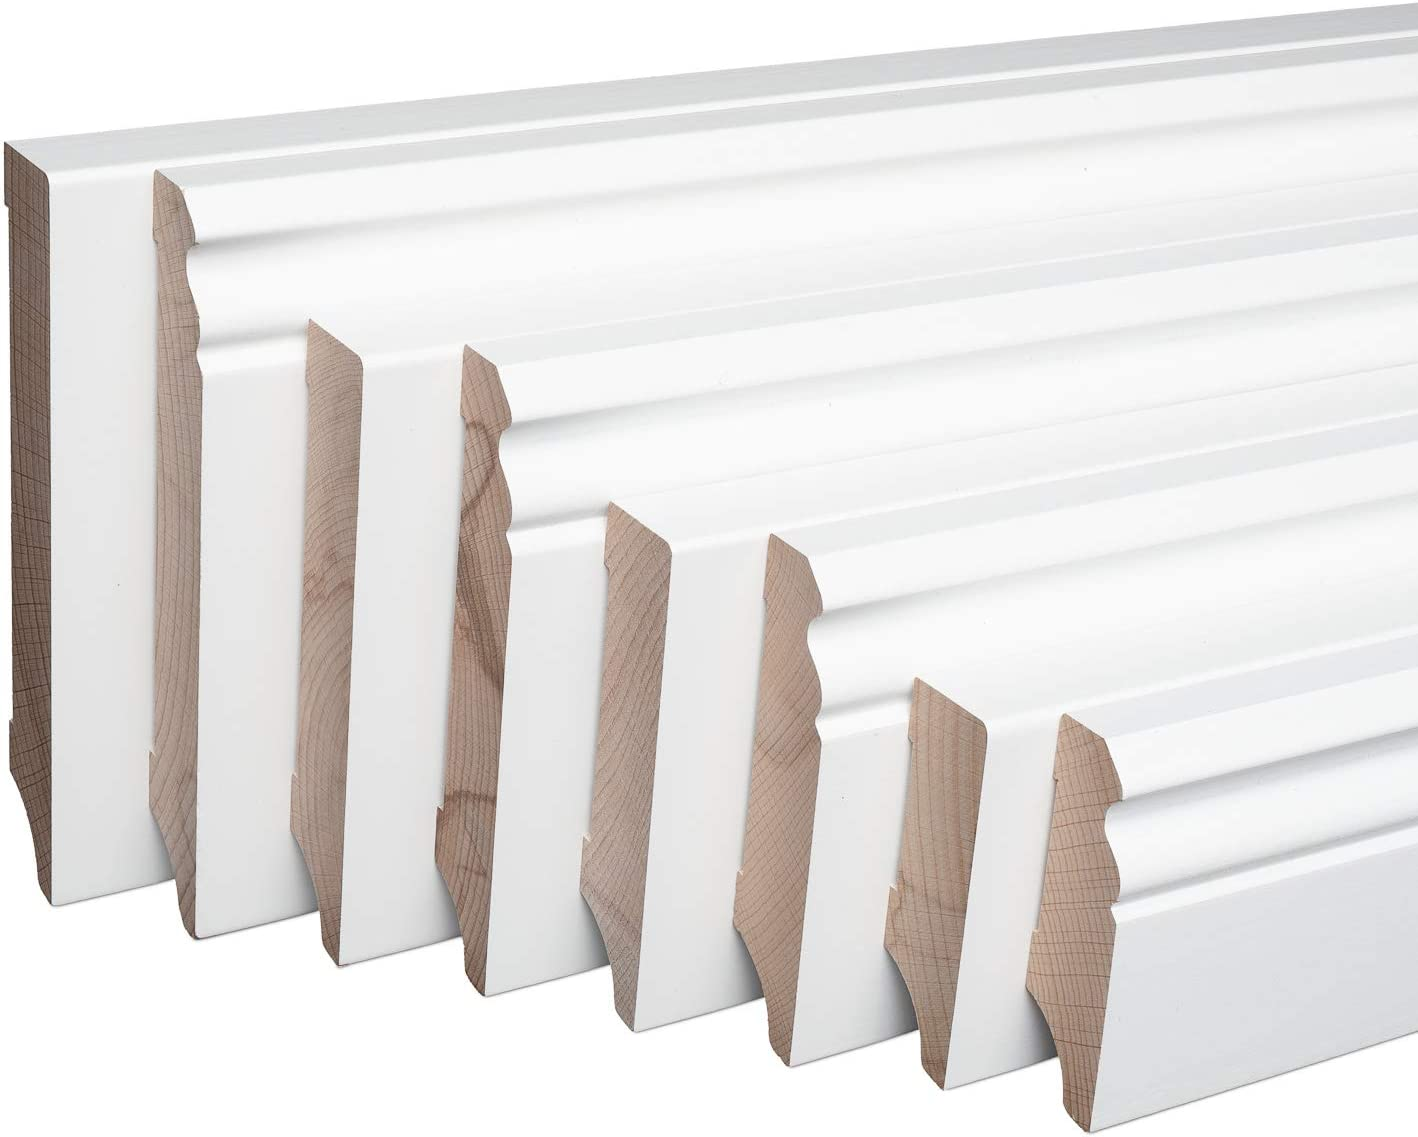 Sockelleiste Massiv Holz Buche wei/ß lackiert Weimarer Profil Modern 80mm